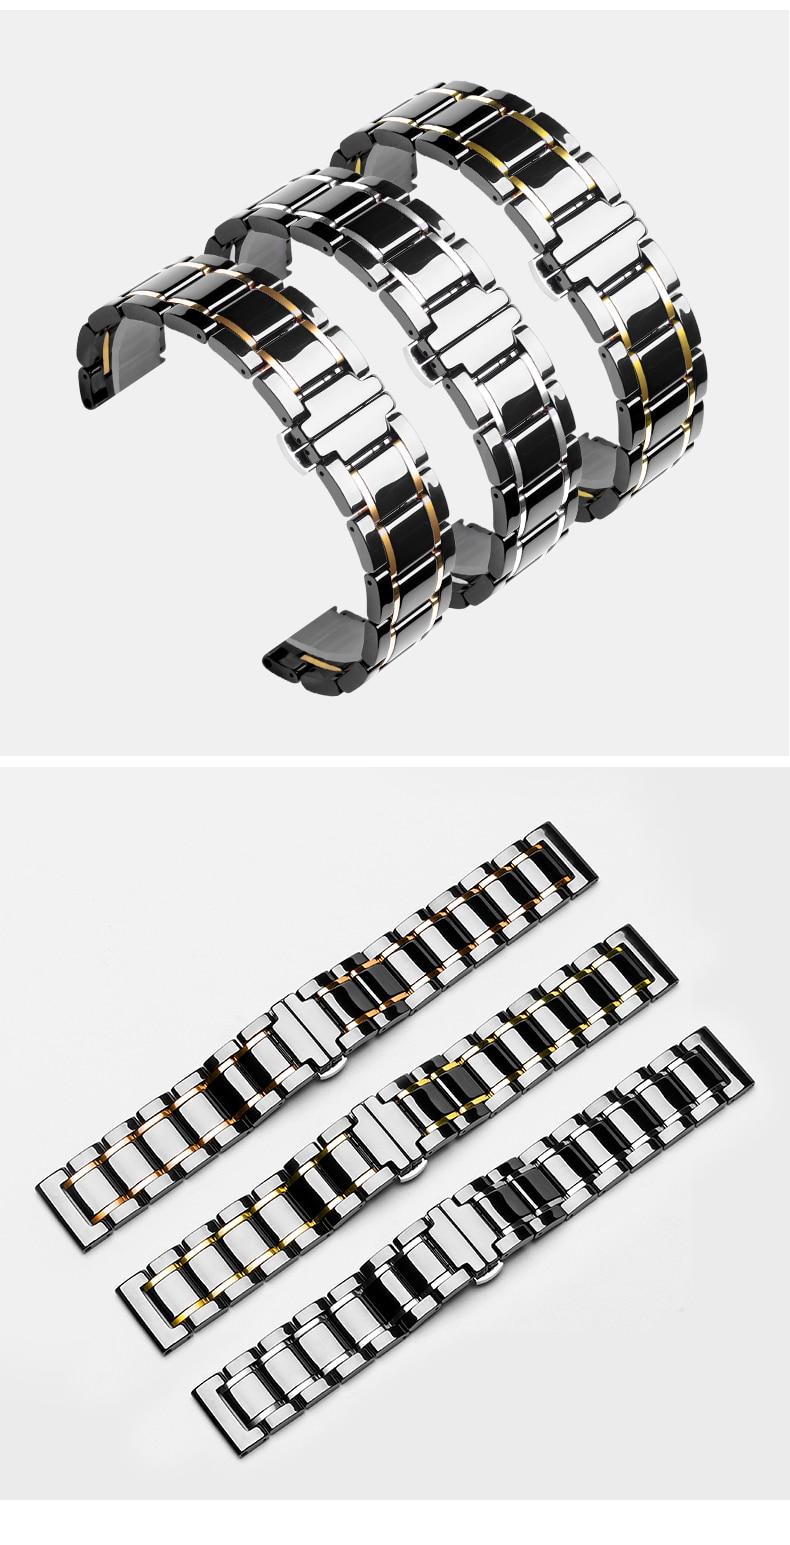 pulseira para samsung gear s4 s2 (versão